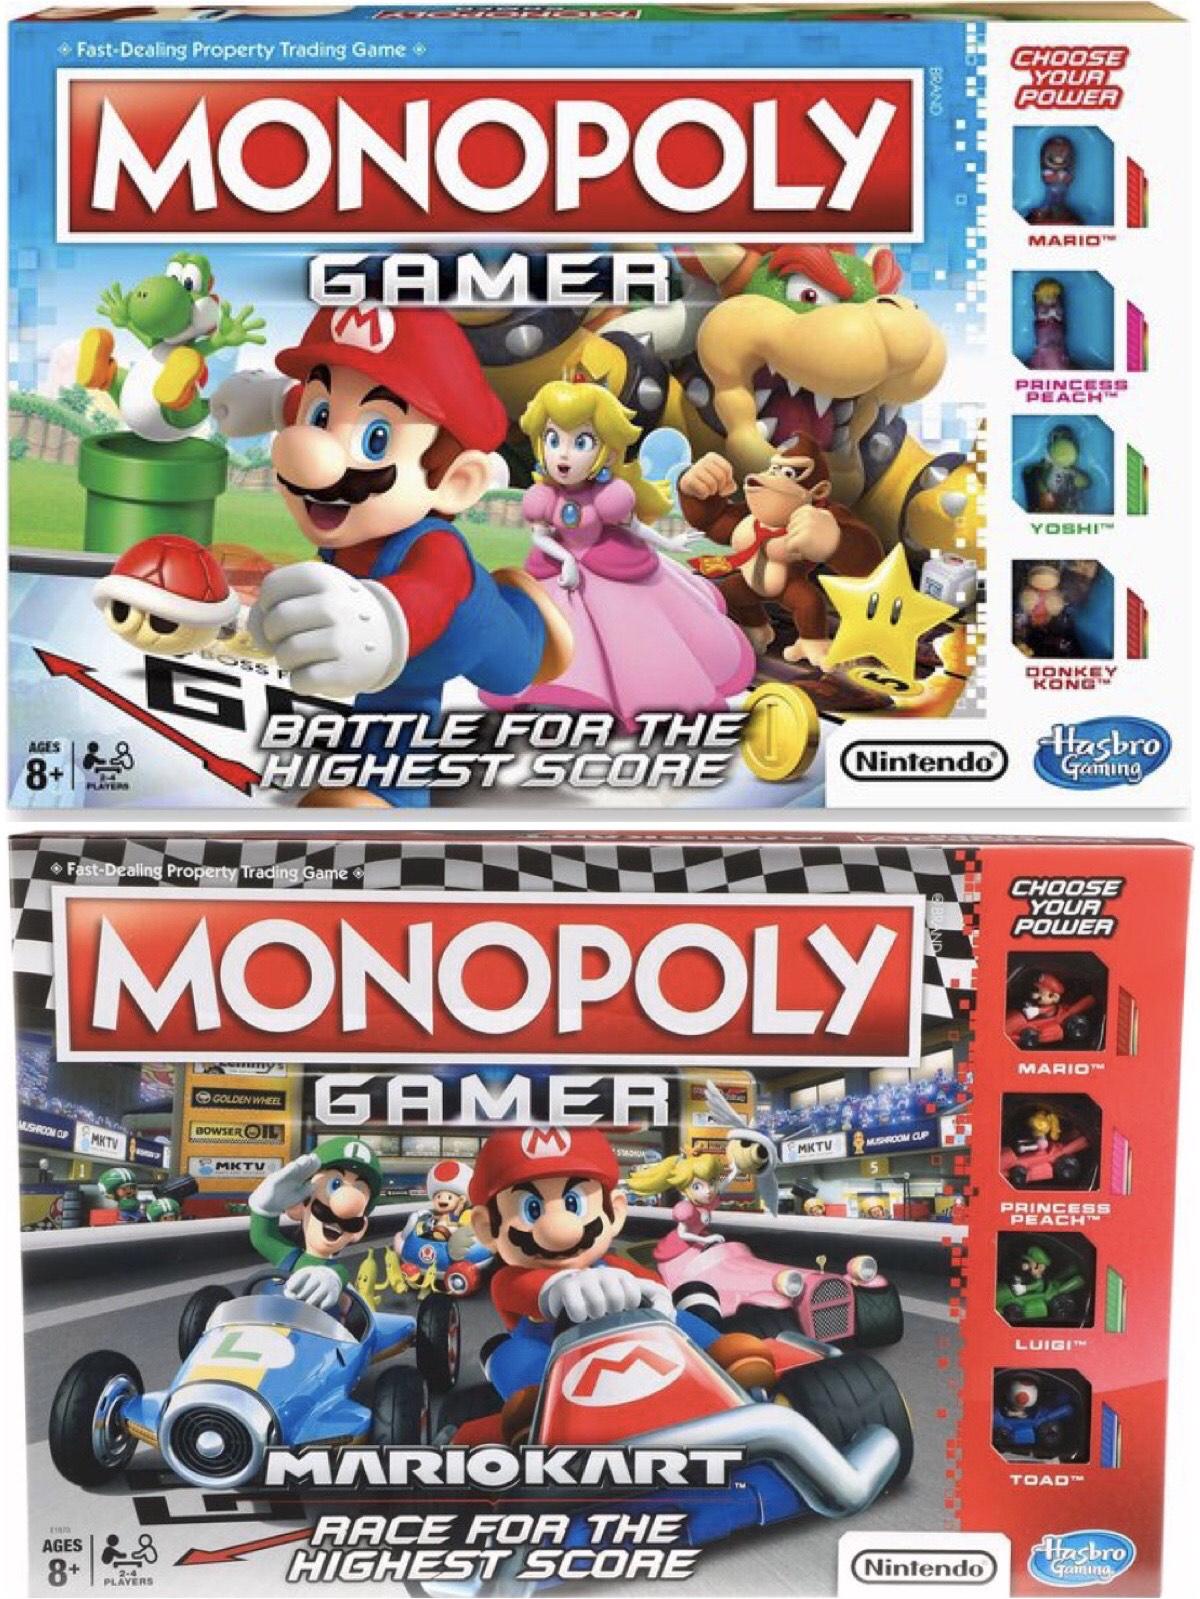 Monopoly Gamer Mario of Mario Kart Bordspel